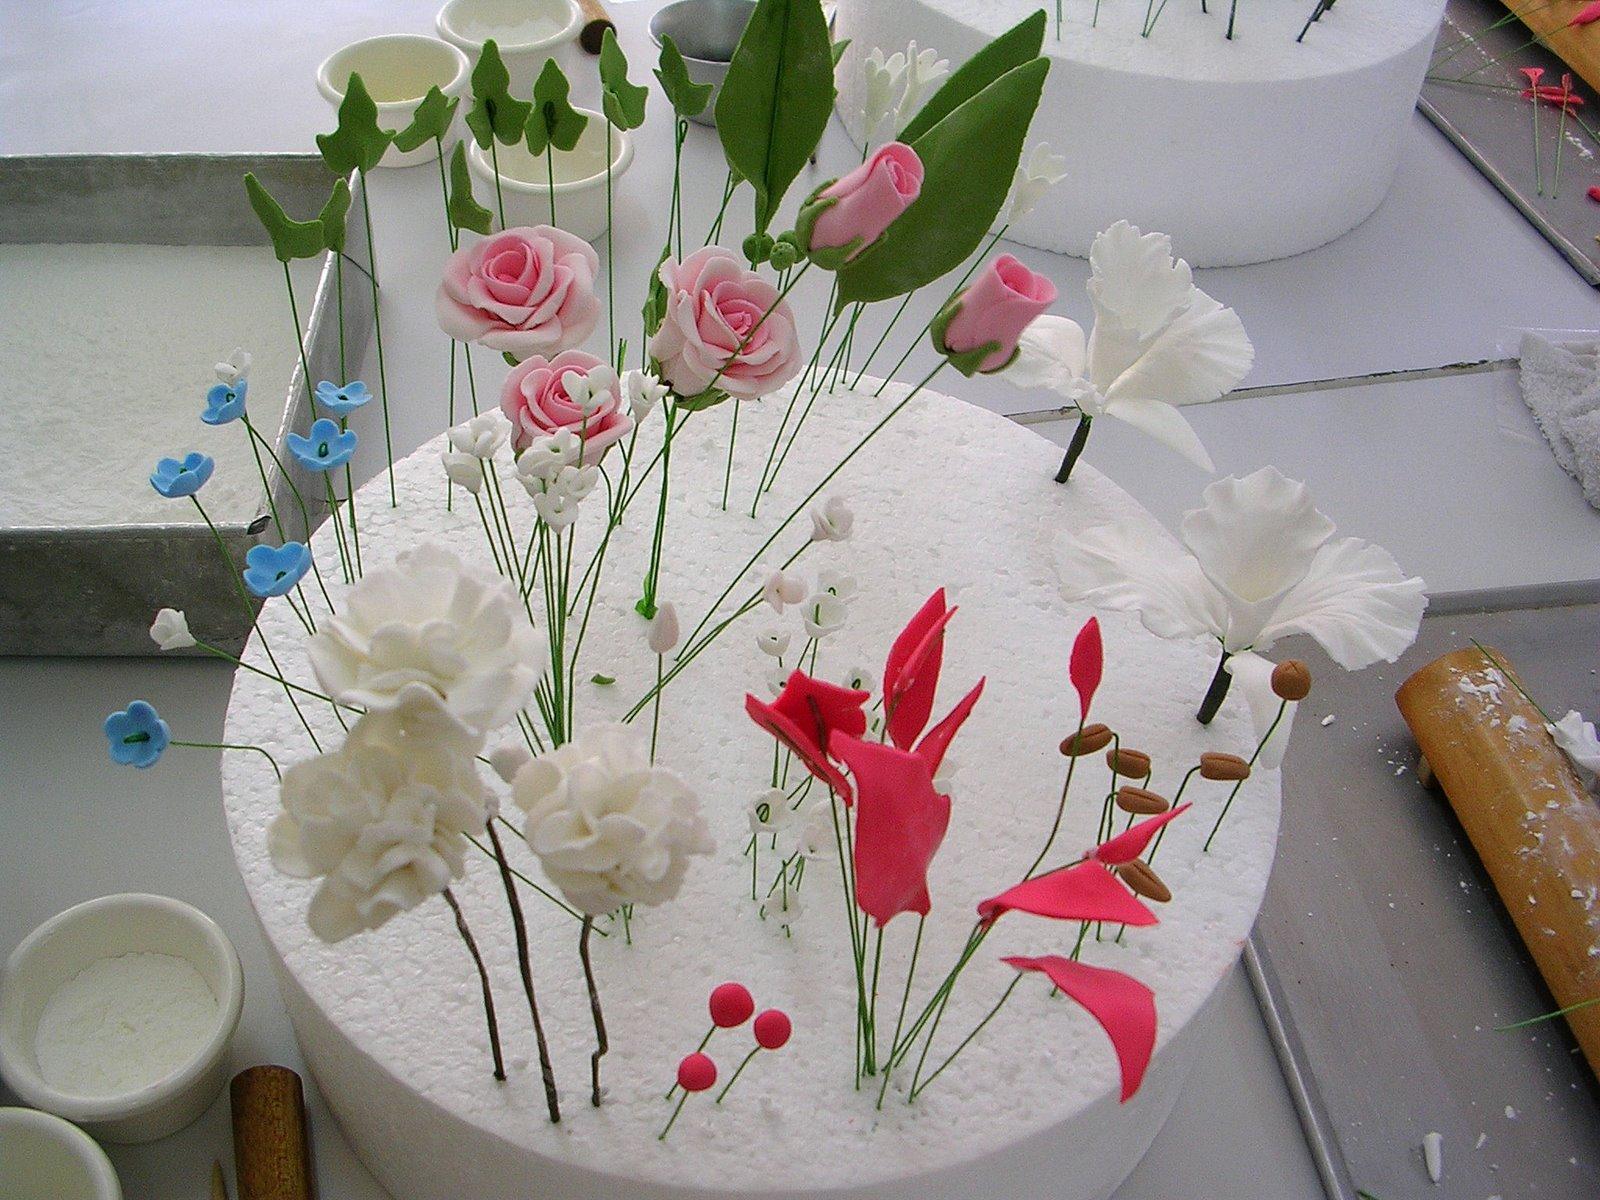 Craft Pastry Gumpaste Flowers 1 2 3